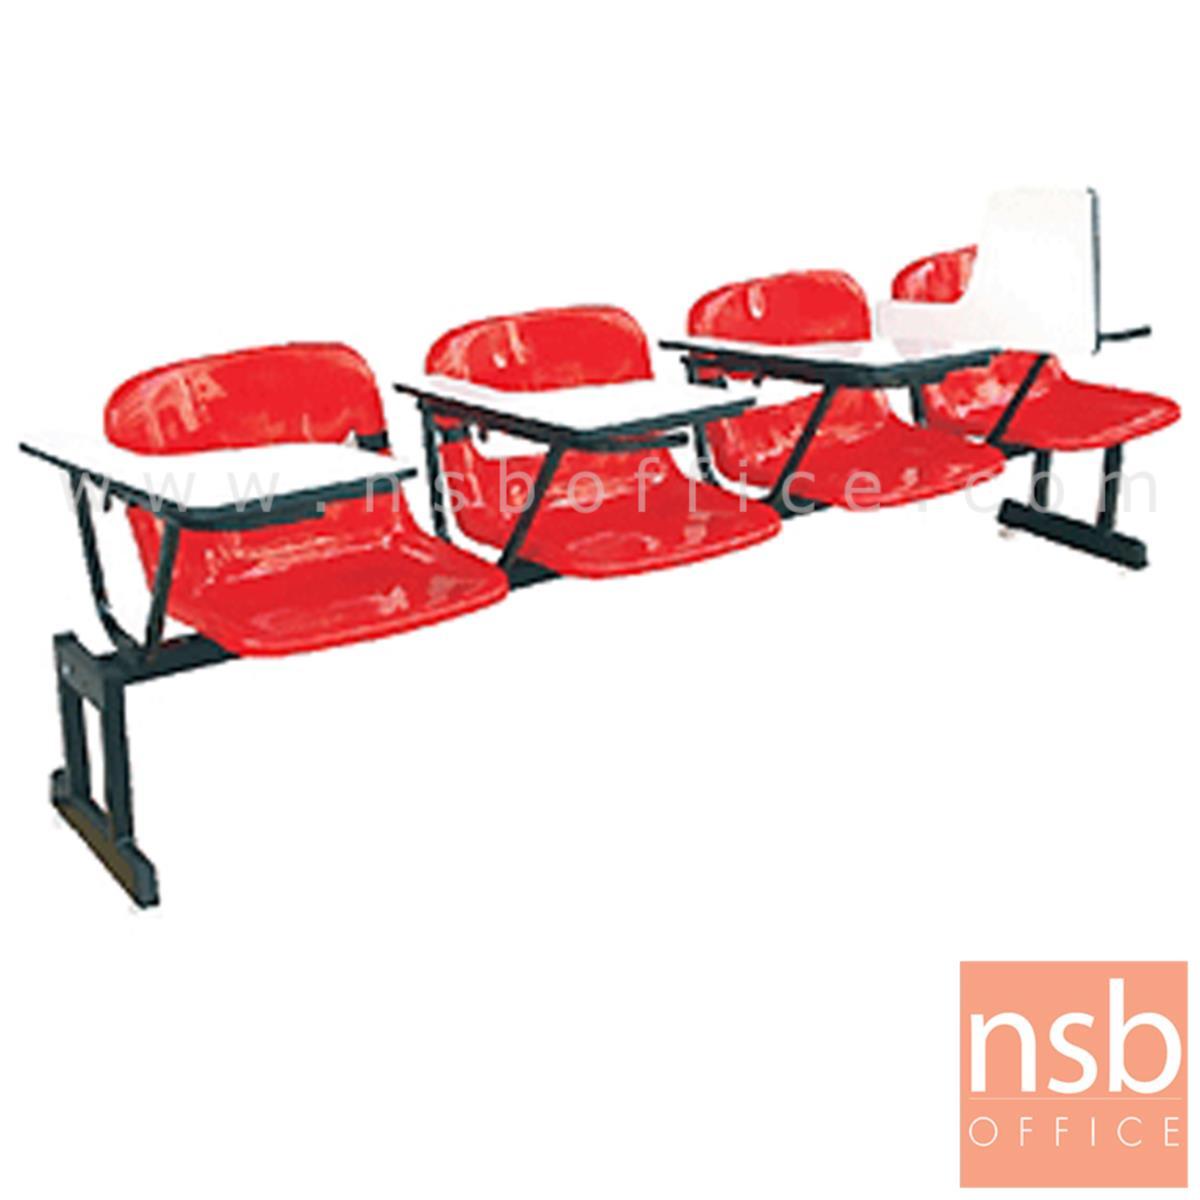 B17A035:เก้าอี้เลคเชอร์แถวเฟรมโพลี่ รุ่น POLY-001  3 และ 4 ที่นั่ง ขาเหล็กเหลี่ยมแบบขาคู่พ่นดำ